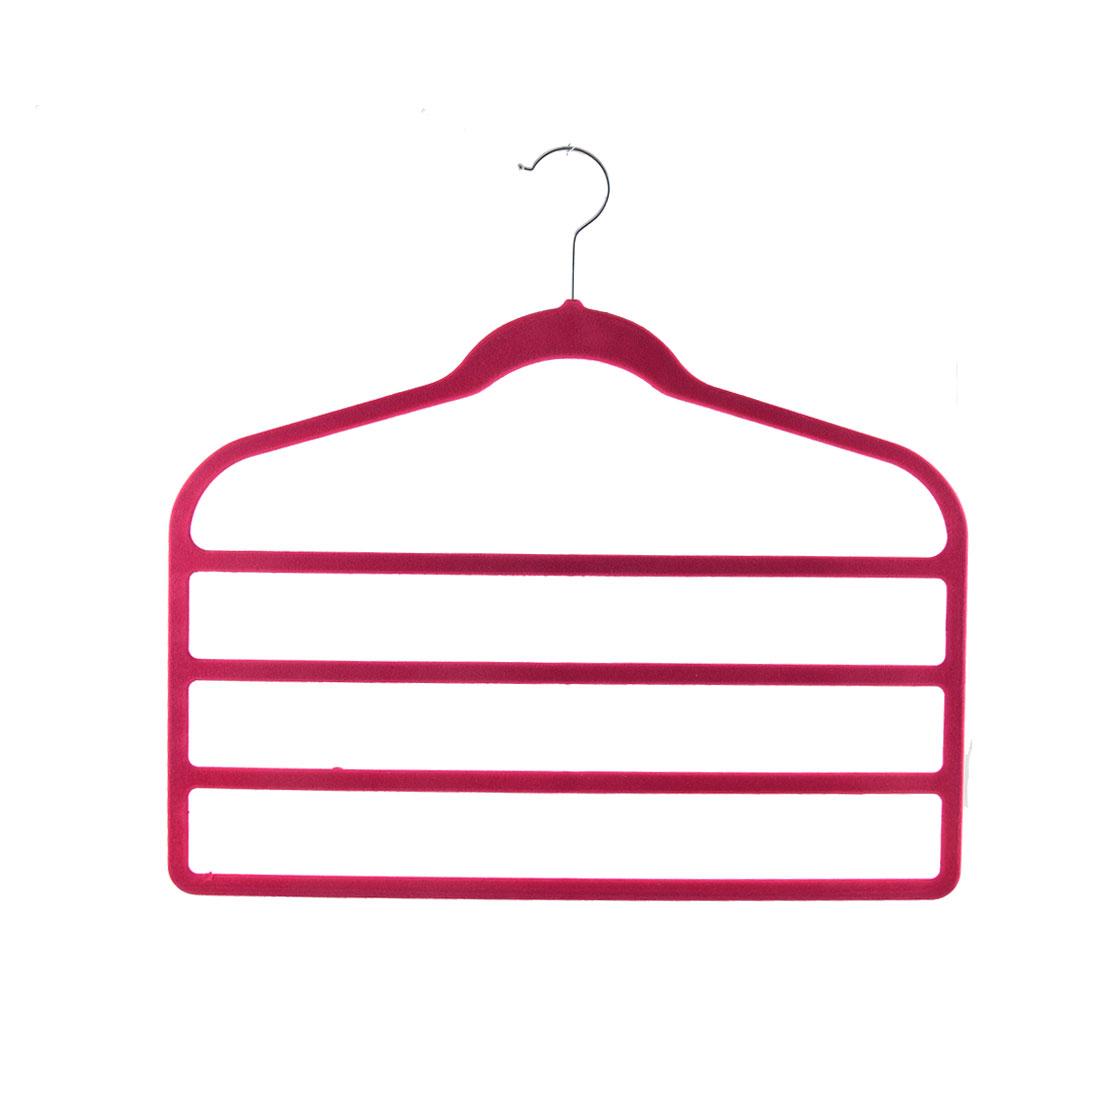 Home Velvet Anti-slip Shawl Coat Towel Clothes Trousers Holder Rack Organizer Fuchsia